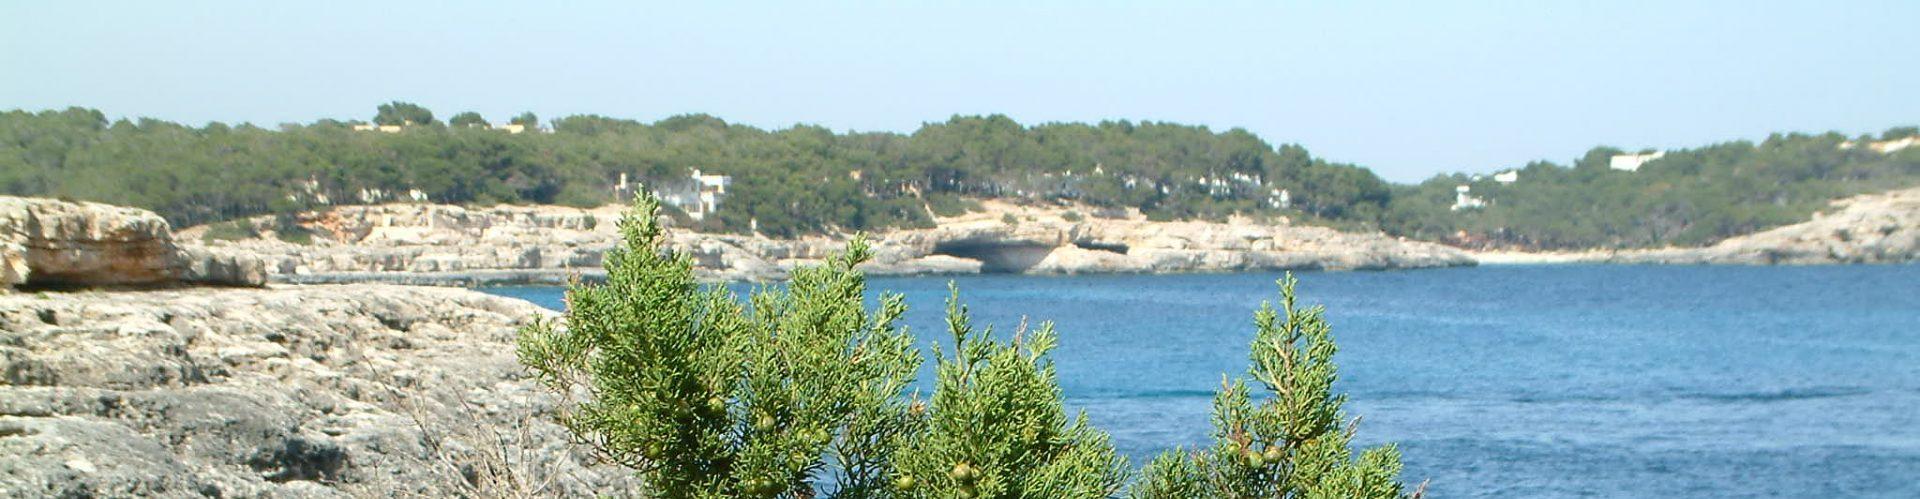 Mallorca-Chris-Donnelly